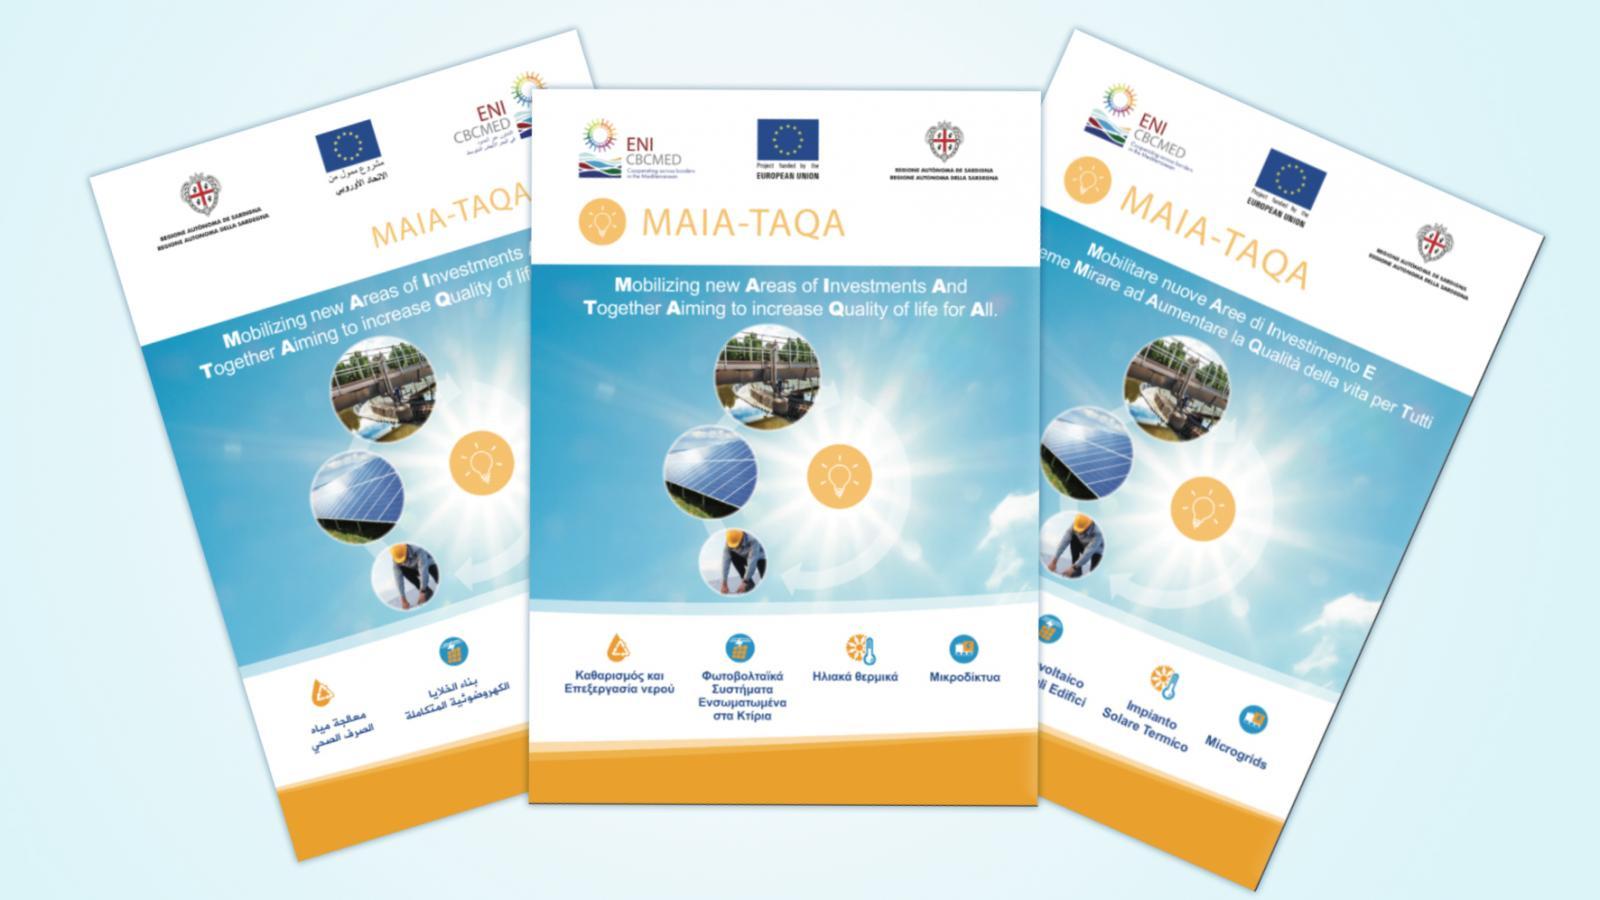 Design Per Tutti Com la brochure du projet maia-taqa est désormais disponible en